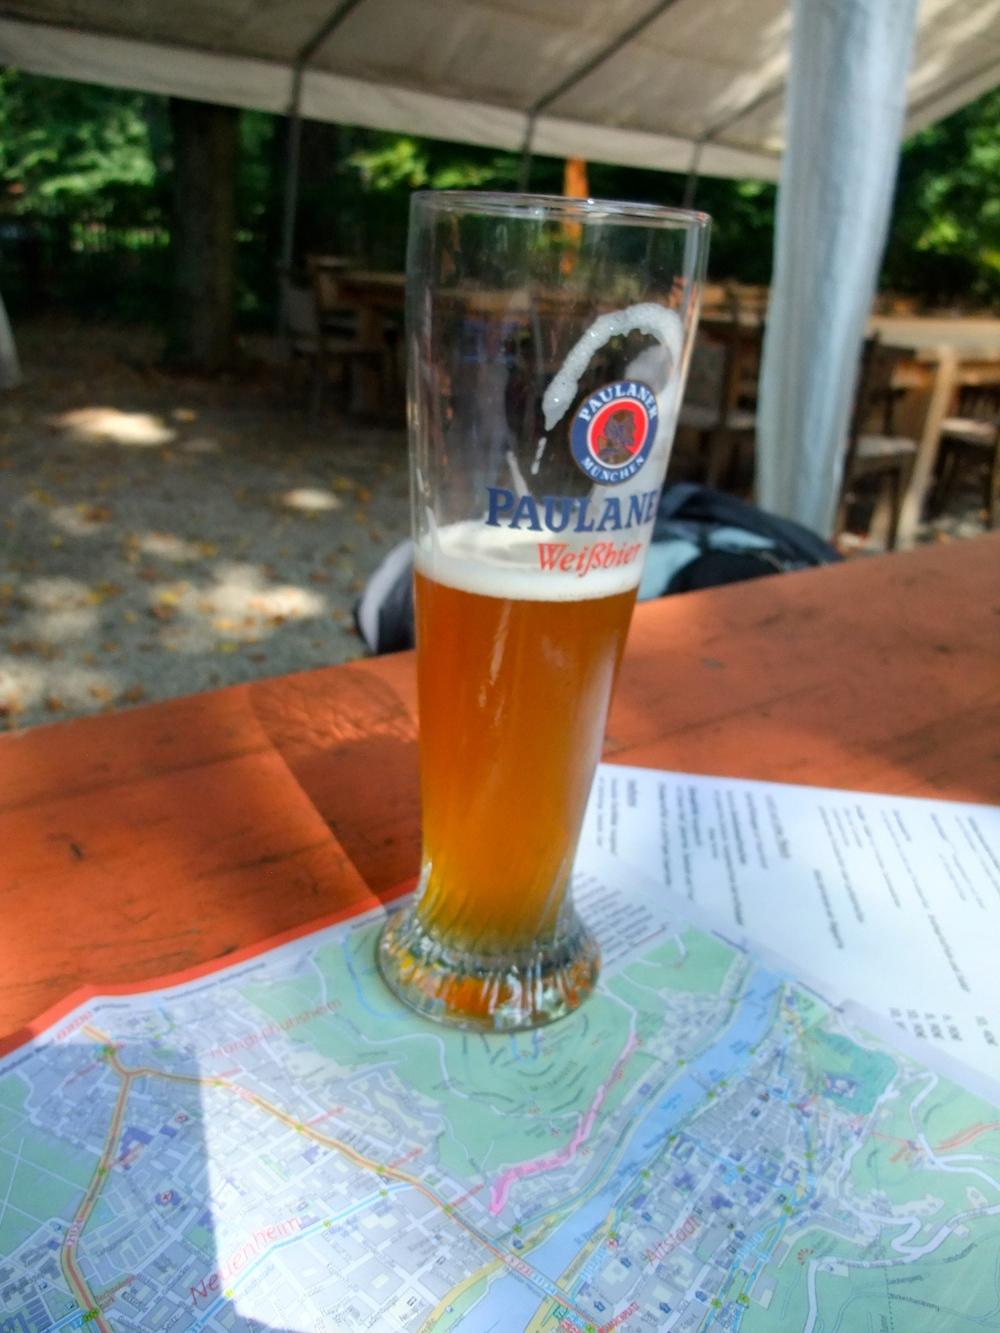 Victory beer at Waldschenke